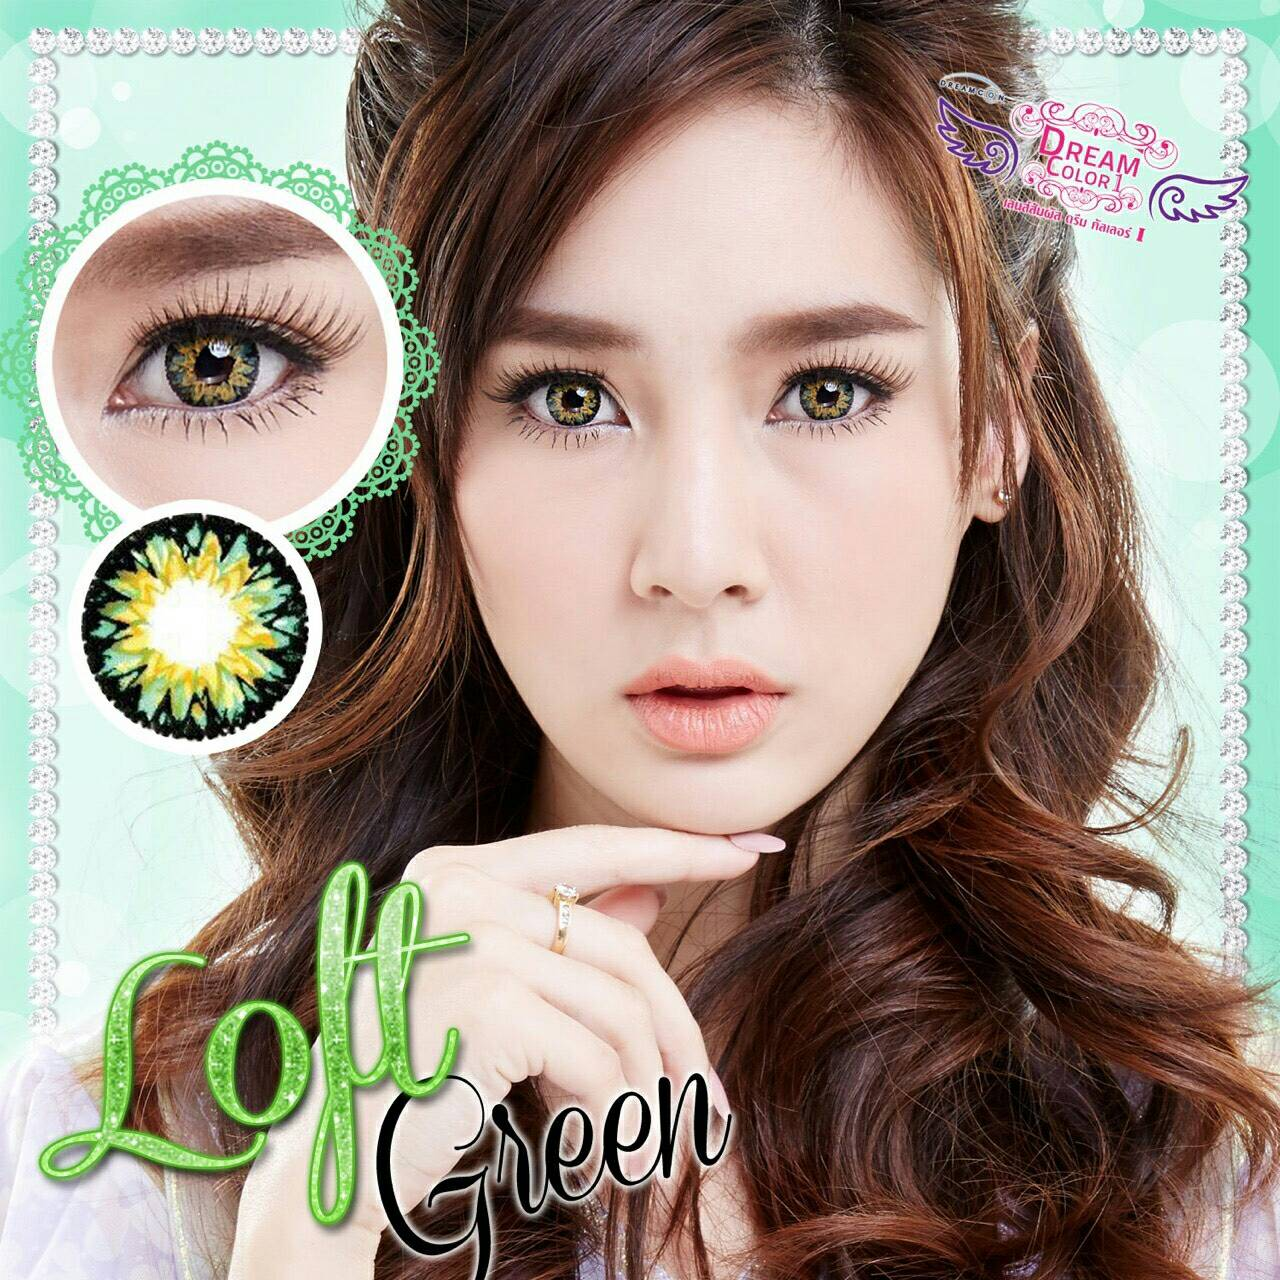 Loft Green Dreamcolor1เลนส์นิ่มใส่สบาย คอนแทคเลนส์ ขายส่งคอนแทคเลนส์ ขายส่งBigeye Bigeyeเกาหลี